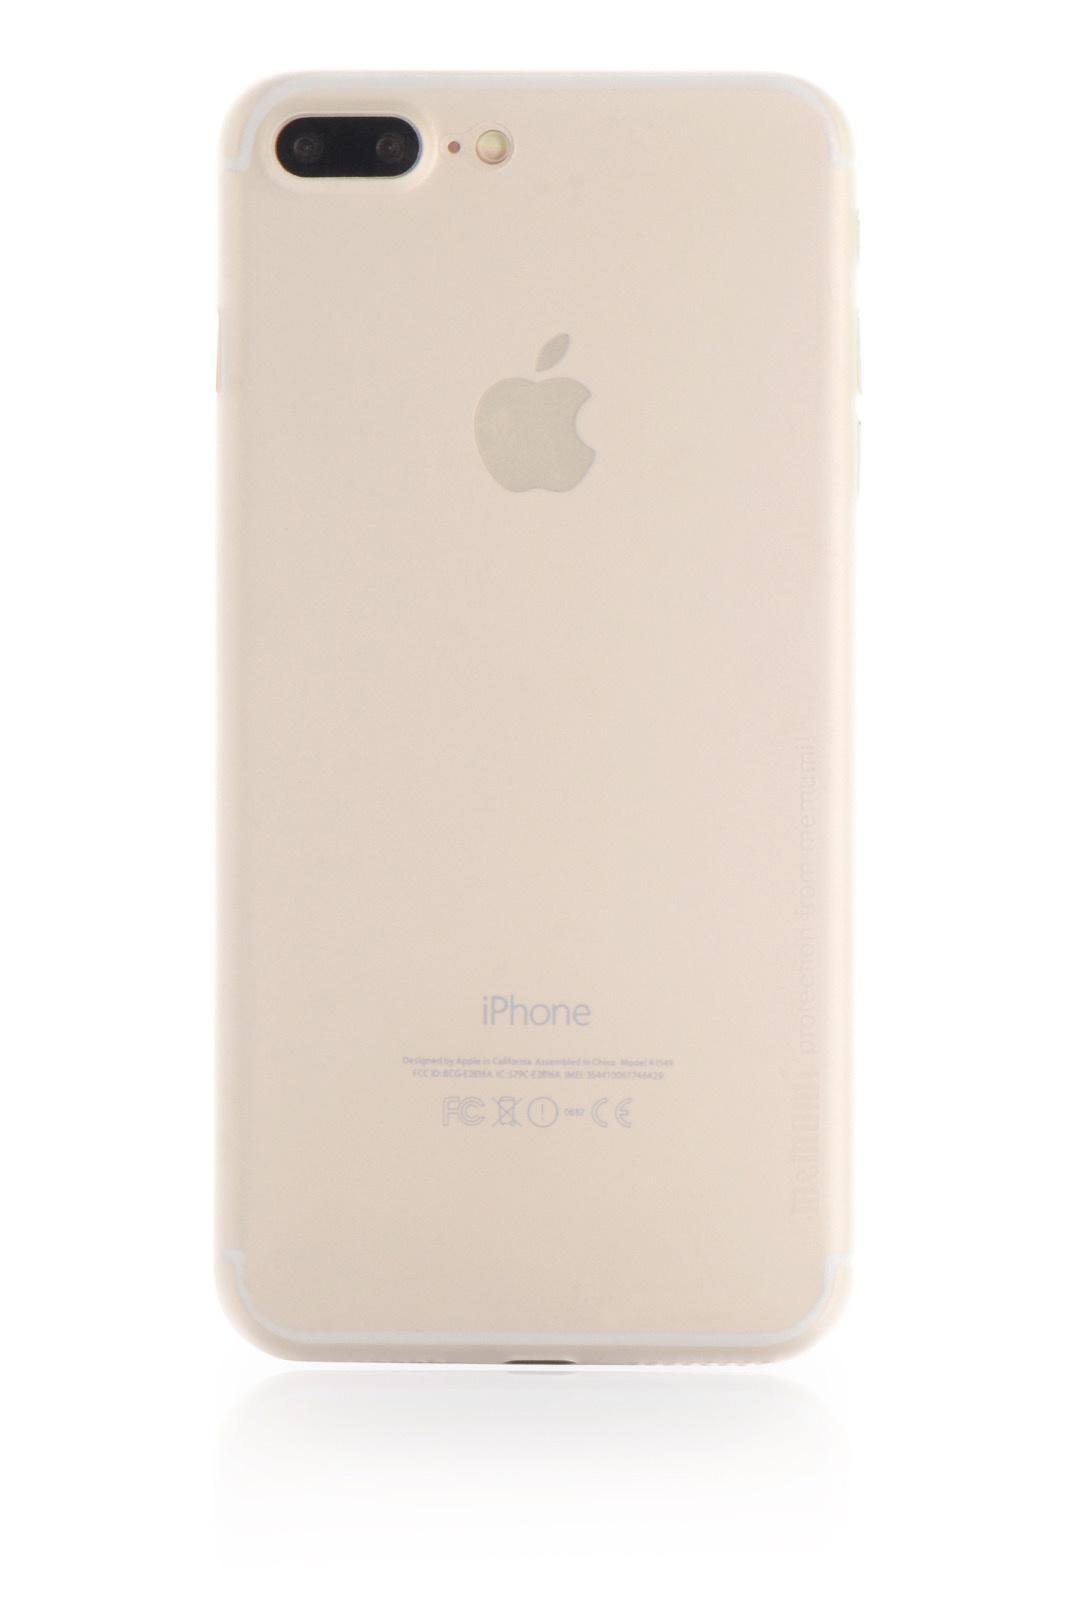 "Чехол для сотового телефона Memumi Ultra Slim Premium 901641 пластик 0.3 mm для Apple iPhone 7 Plus/8 Plus 5.5"", белый"